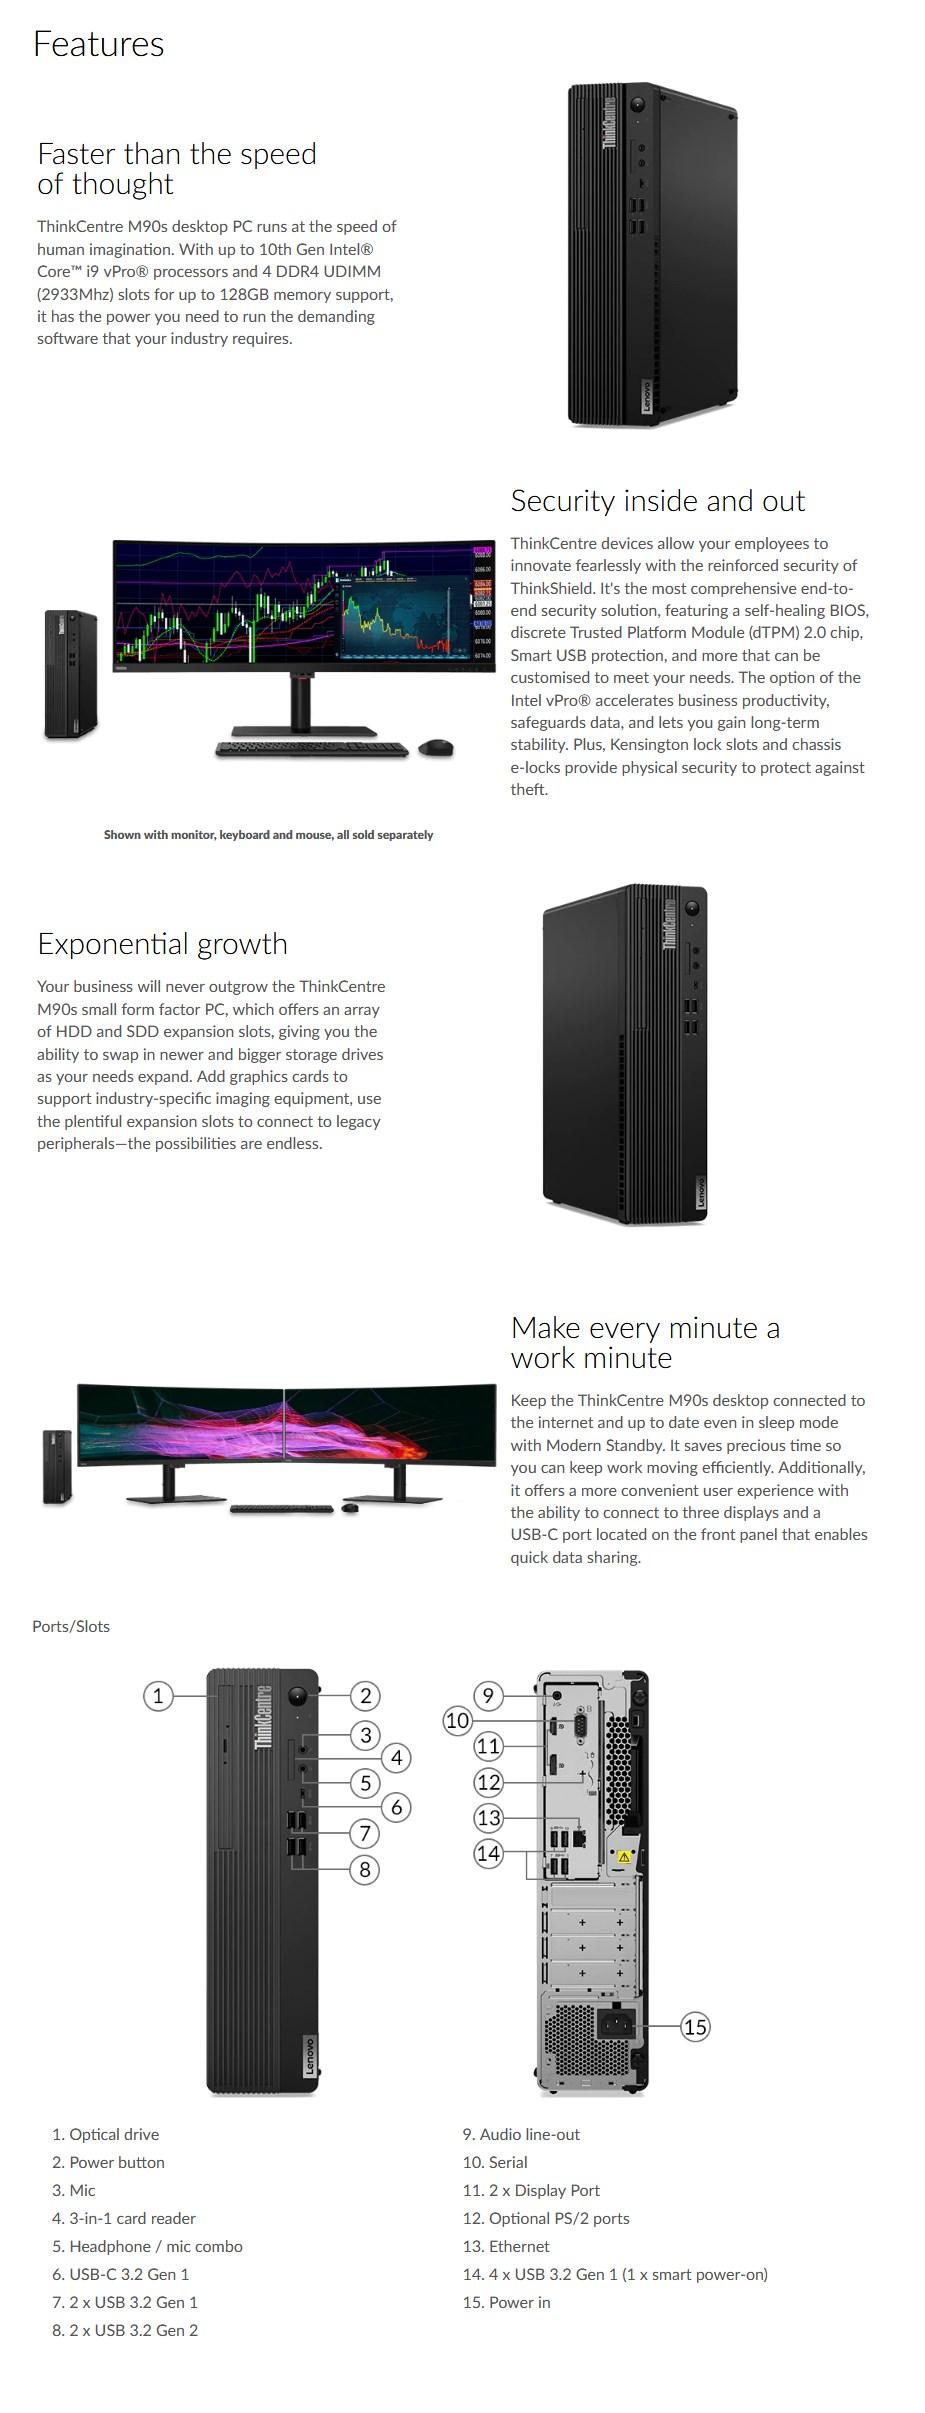 lenovo-m90s-sff-desktop-i510500-16gb-512gb-windows-10-pro-ac41129-6.jpg